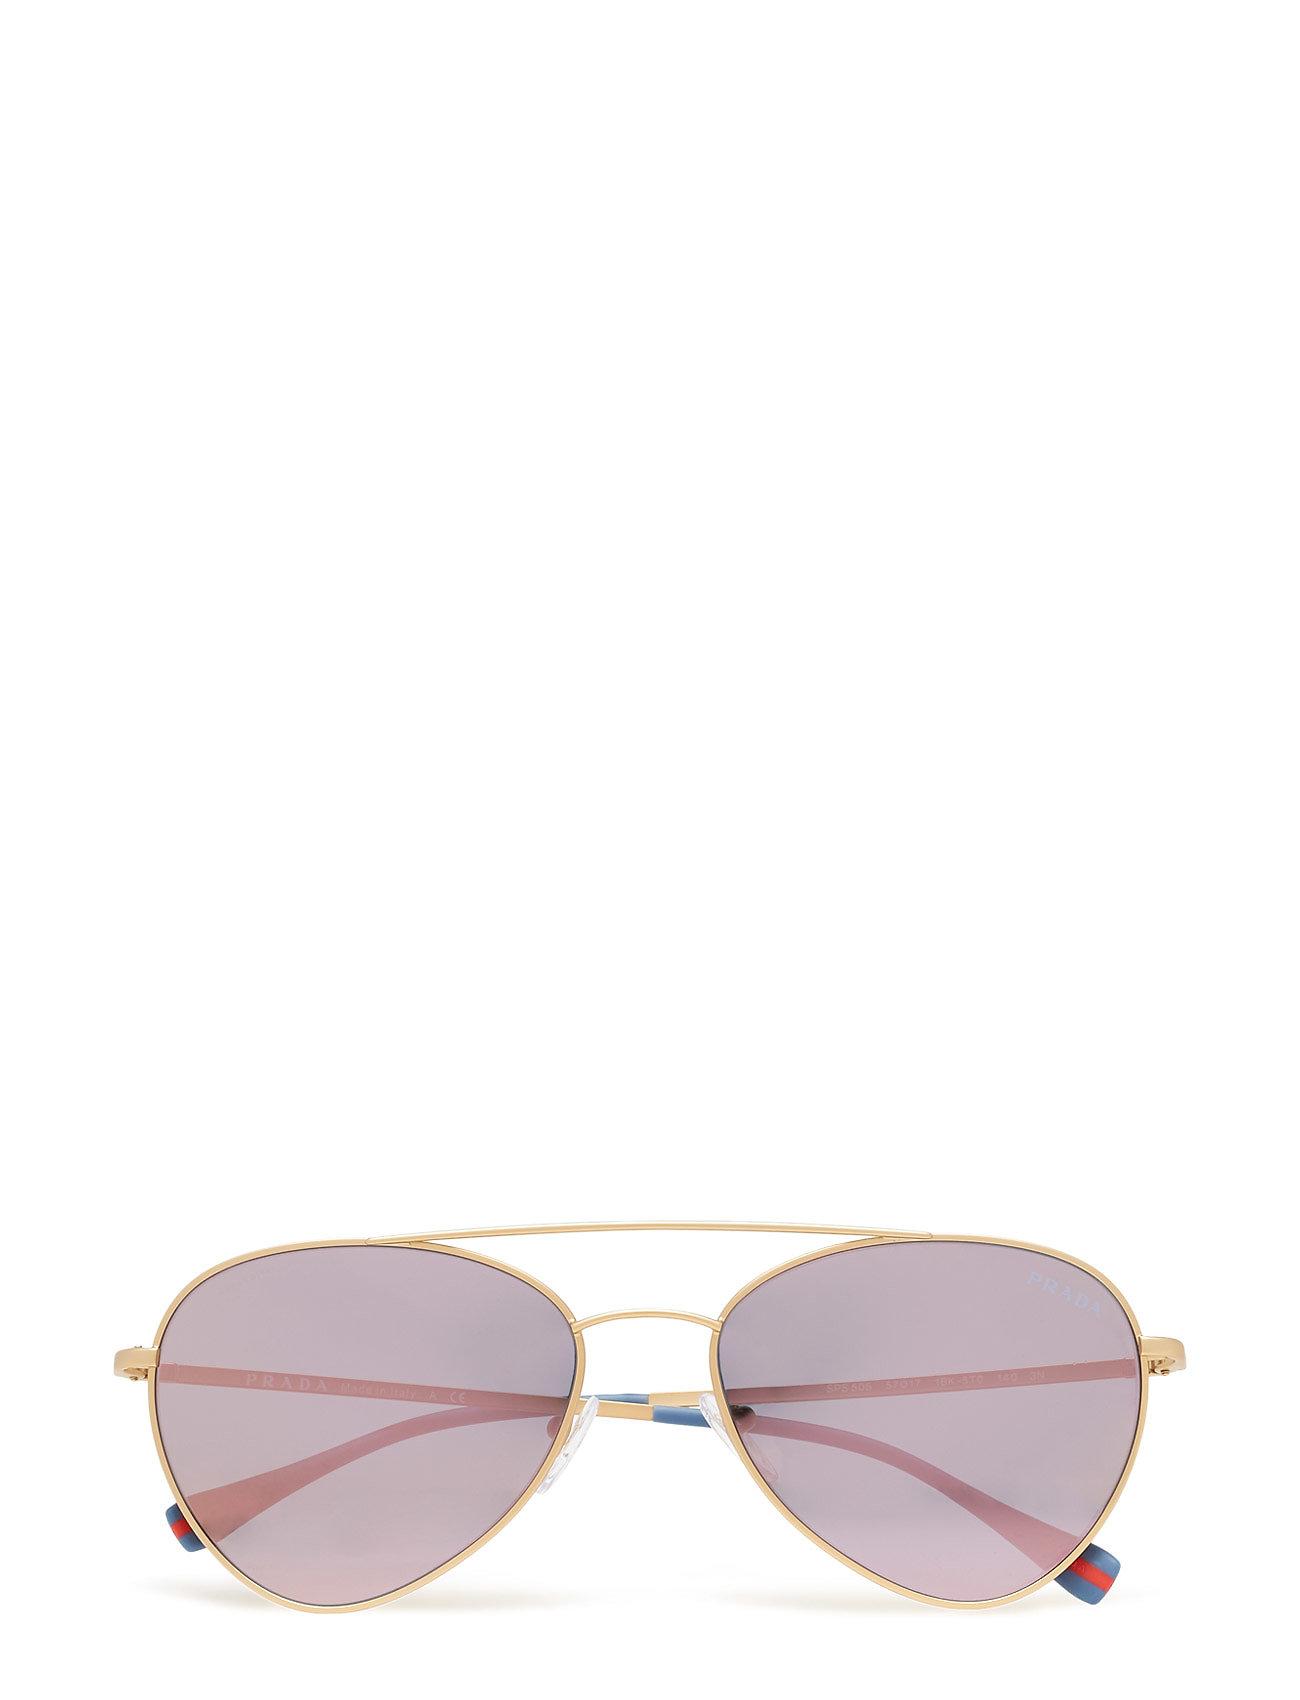 Image of Prada Sport Sunglasses Lifestyle Pilottilasit Aurinkolasit Vaaleanpunainen Prada Sport Sunglasses